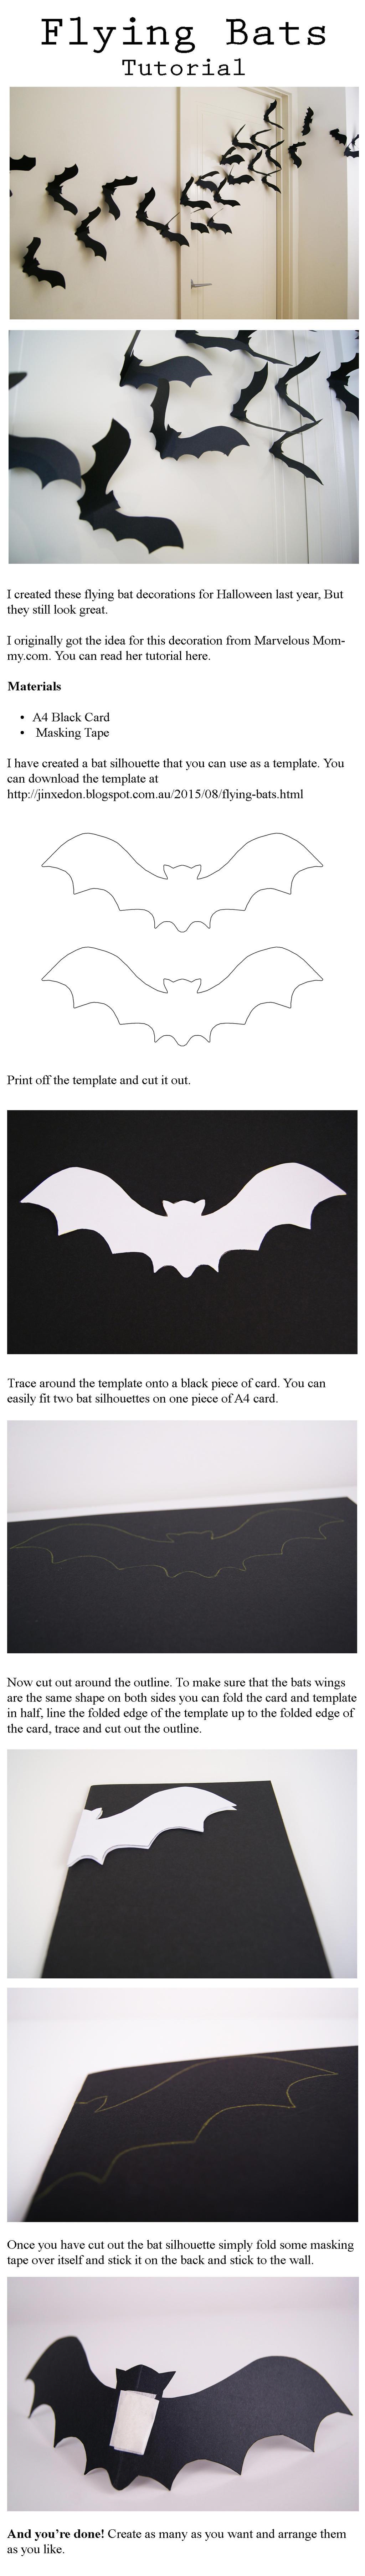 Flying Bat Tutorial